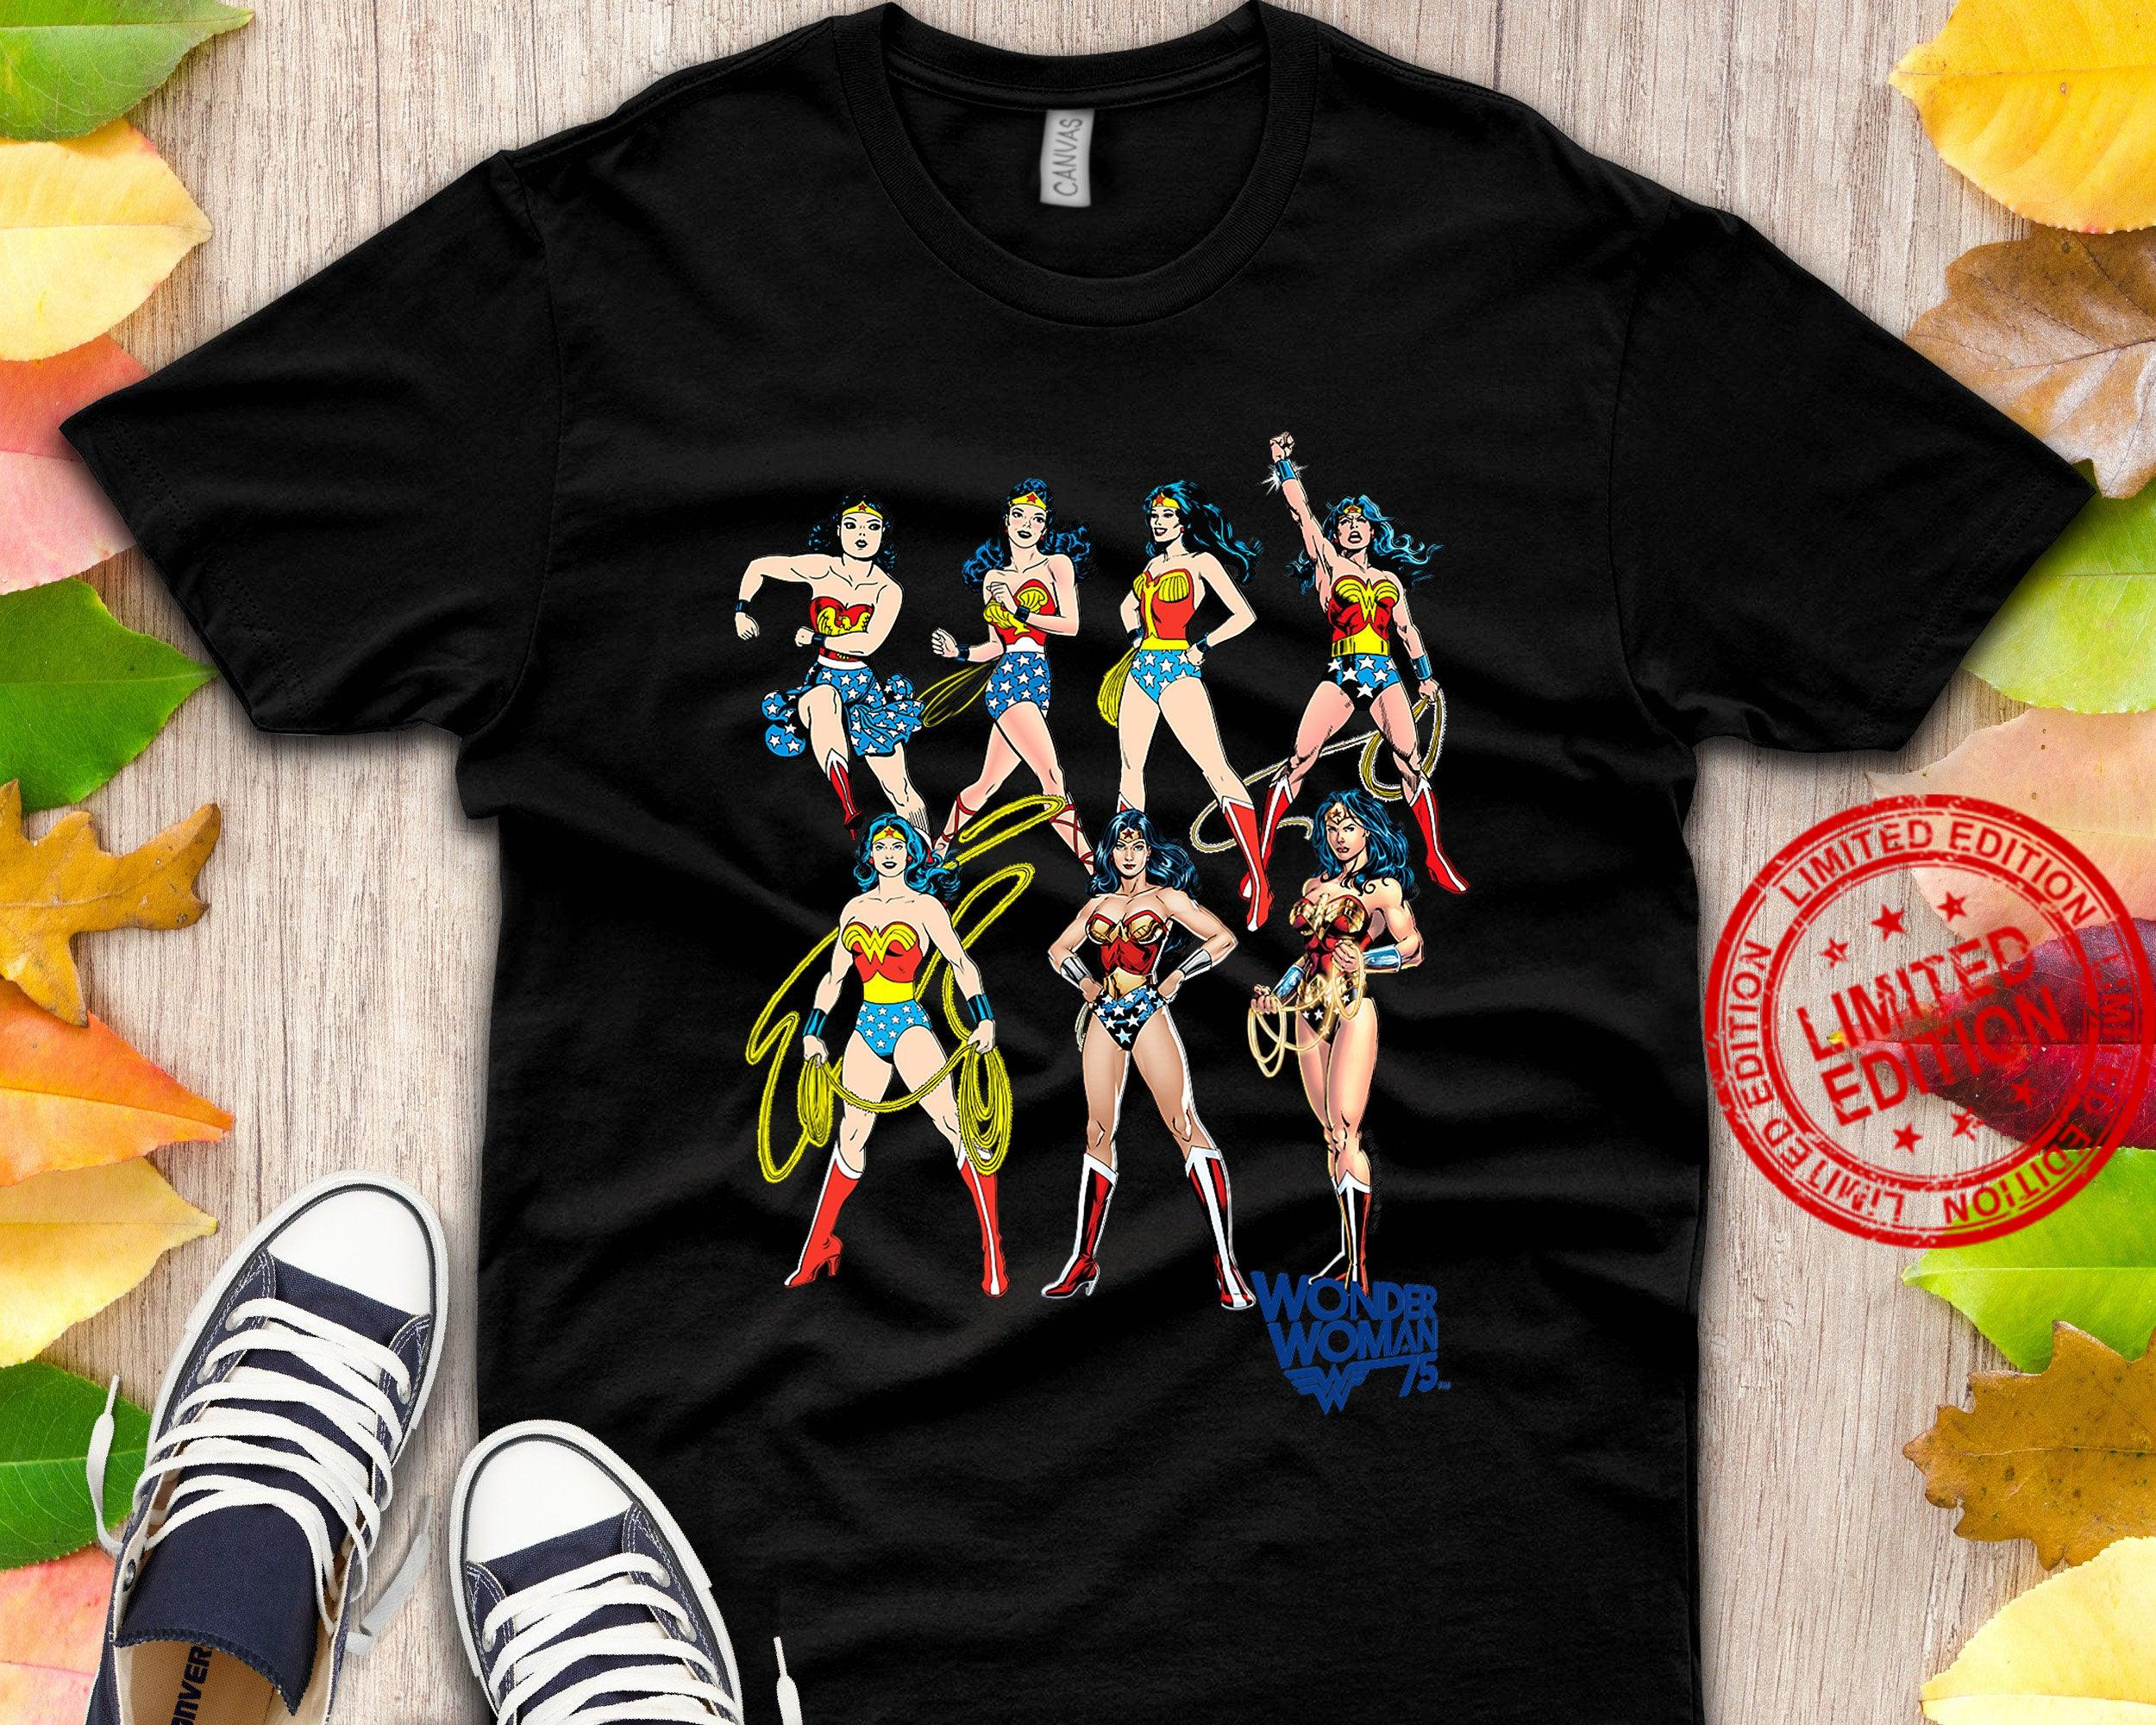 Wonder Woman Decades Later Shirt